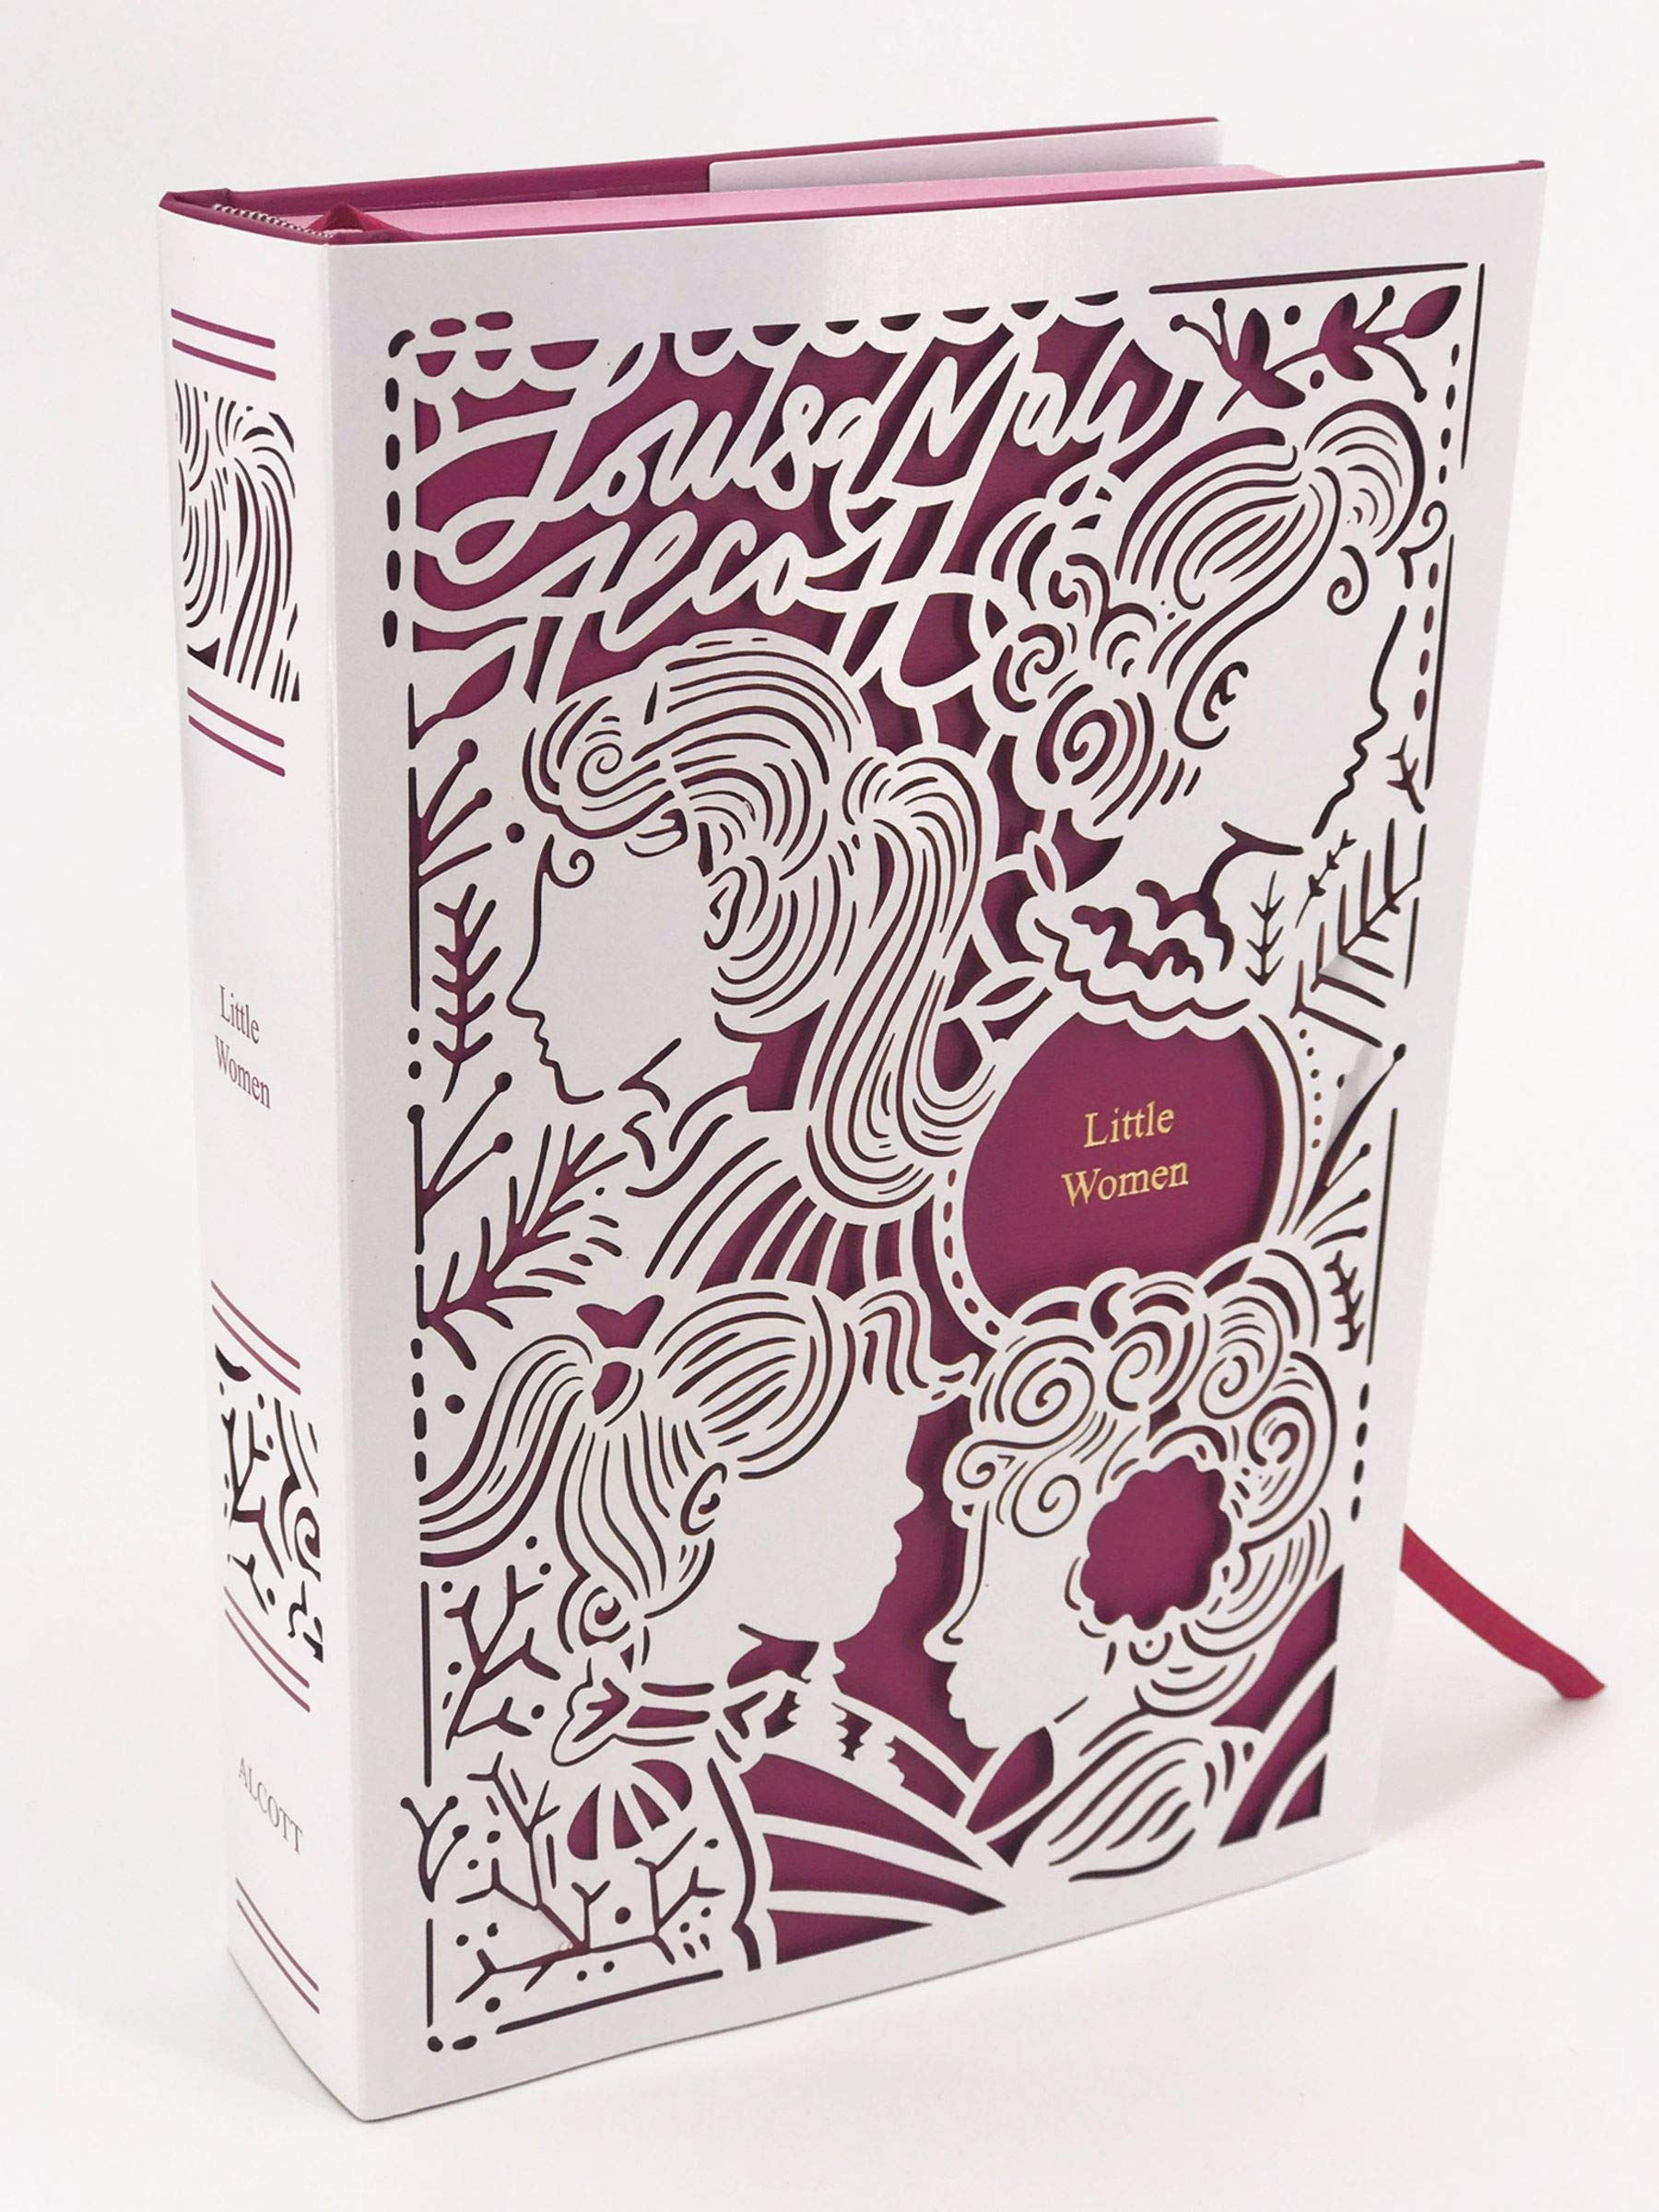 Little Women (Seasons Edition -- Winter) by HarperCollins Christian Pub.